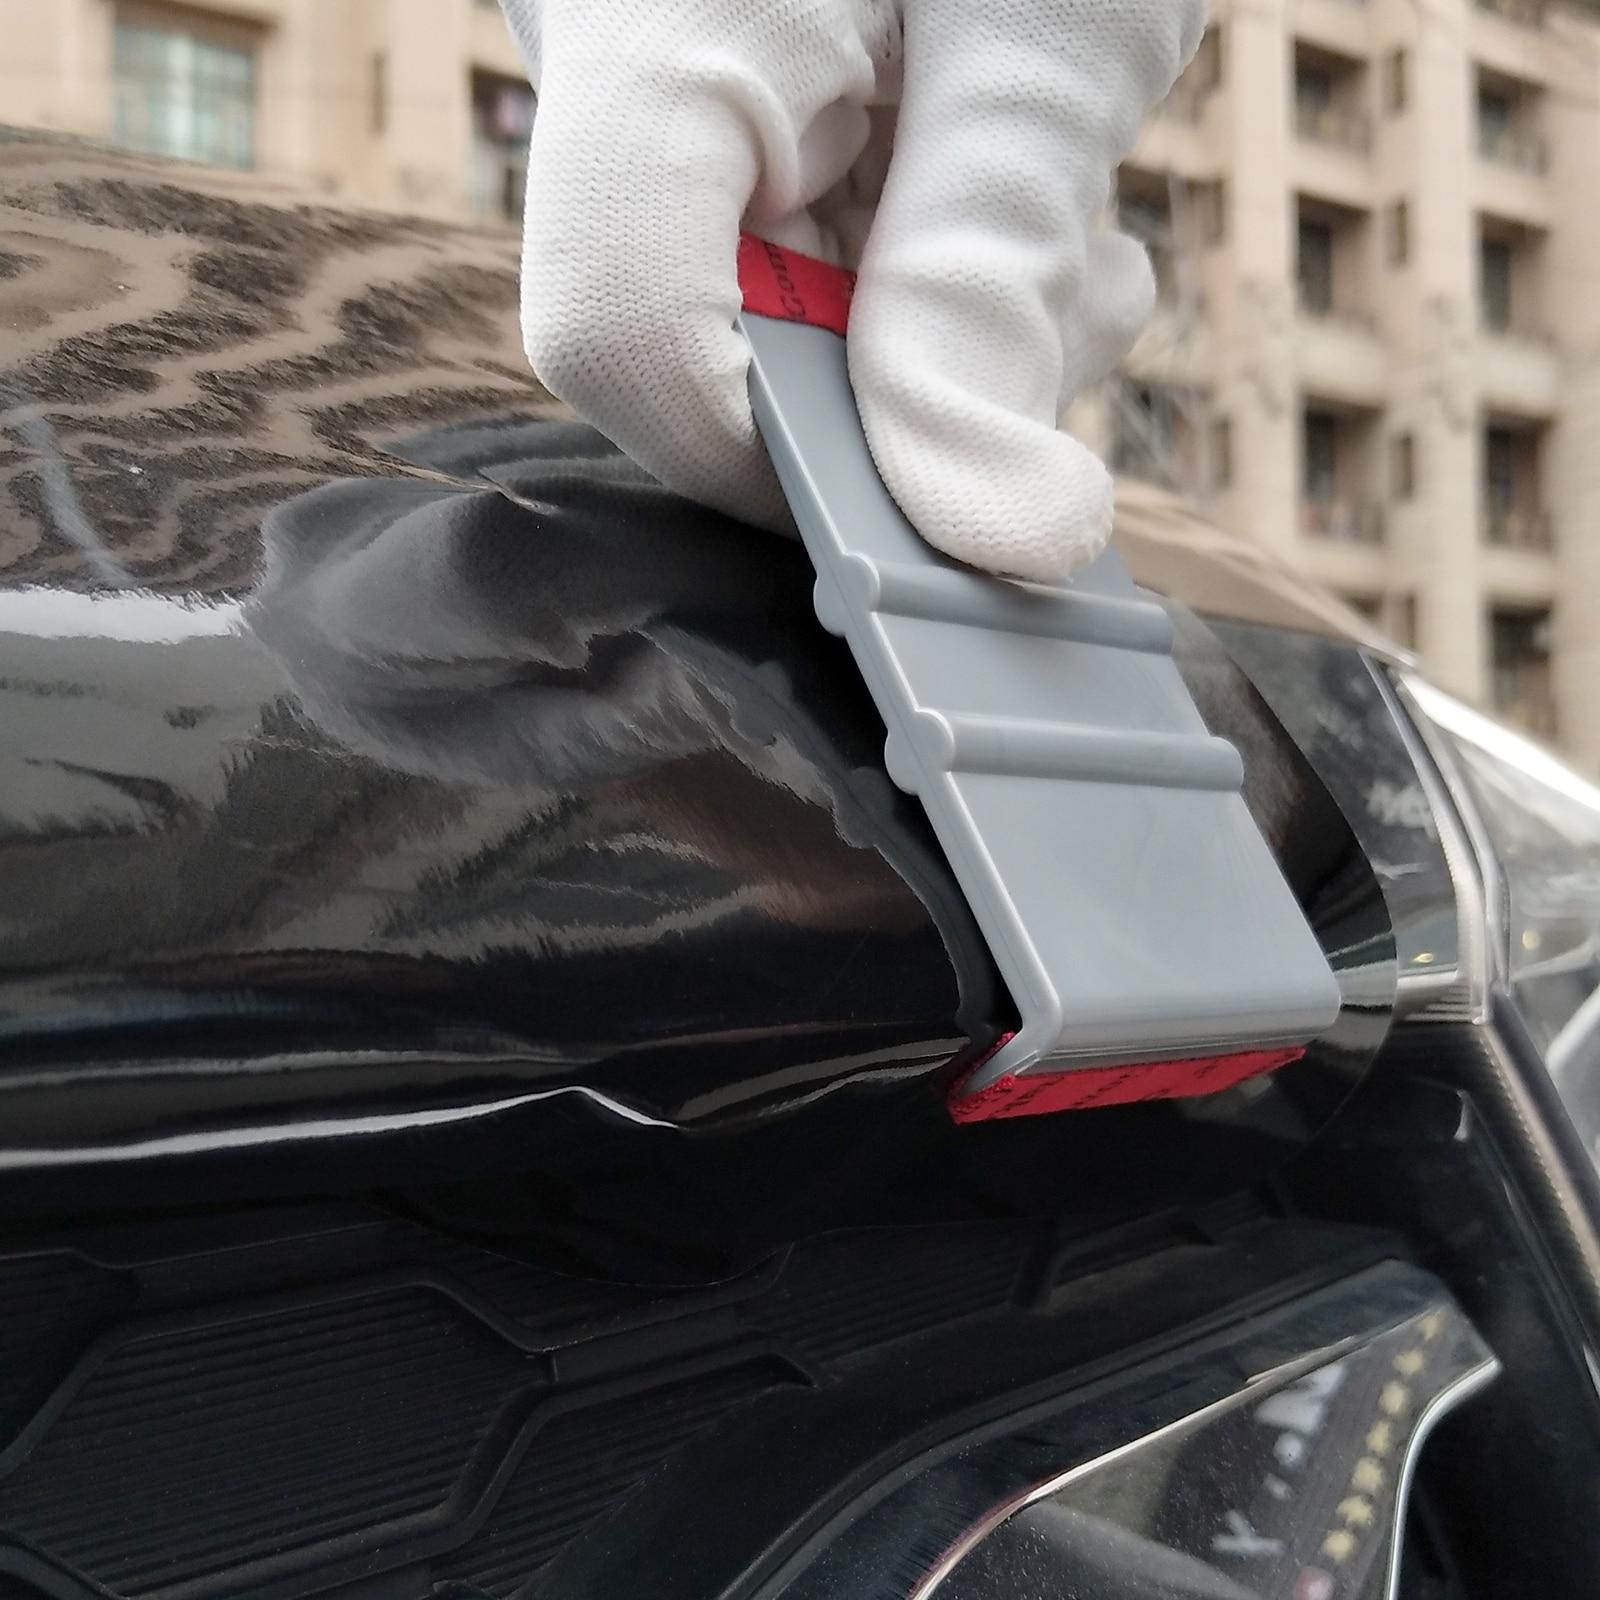 Image 2 - EHDIS Vinyl Wrap Film Pro Tint Microfiber Felt Squeegee Carbon Fiber Suede Scraper Auto Sticker Wrapping Accessories Car Tools-in Scraper from Automobiles & Motorcycles